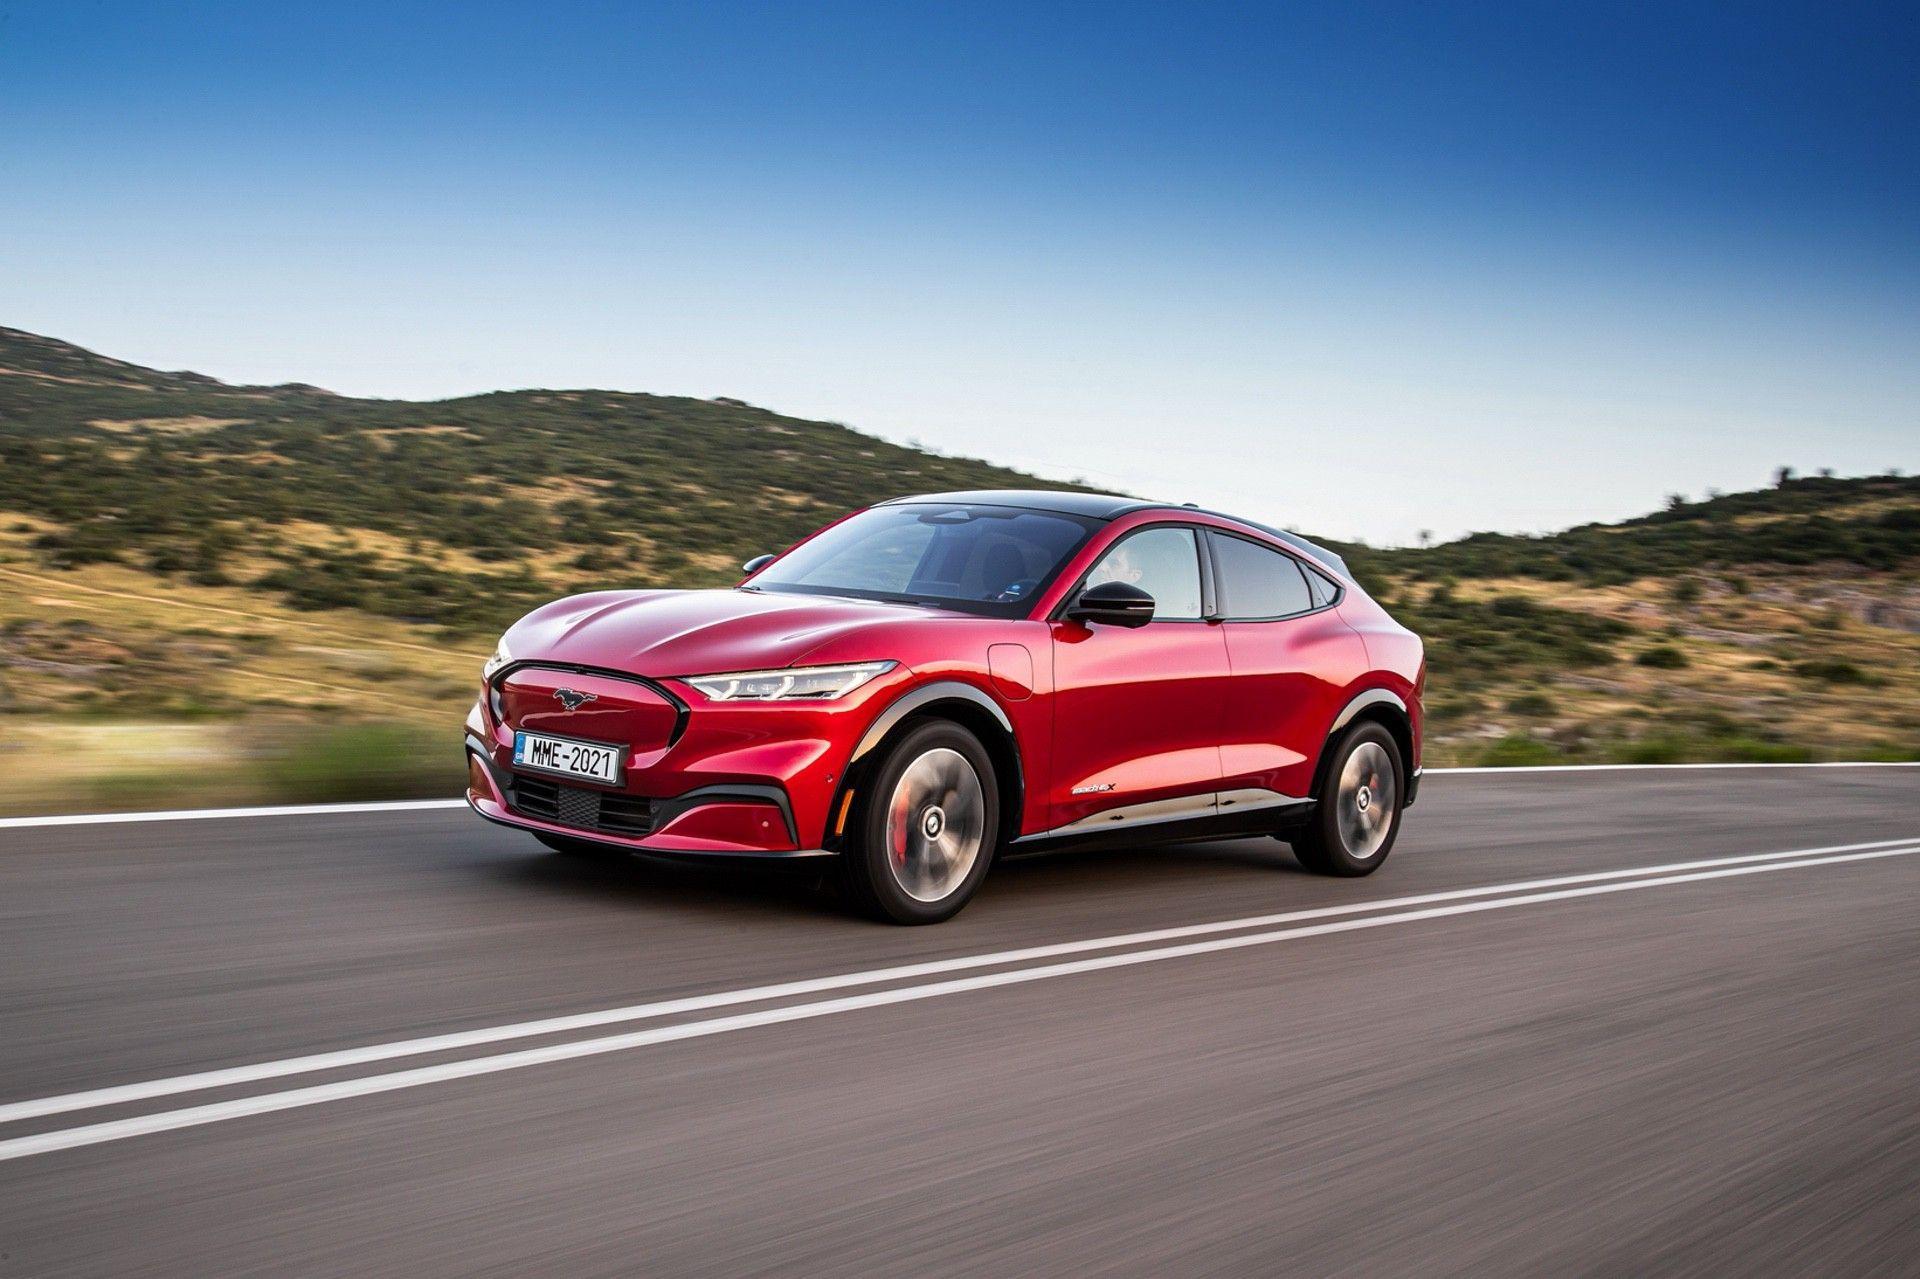 Ford_Mustang_Mach-E_greek_presskit-0100